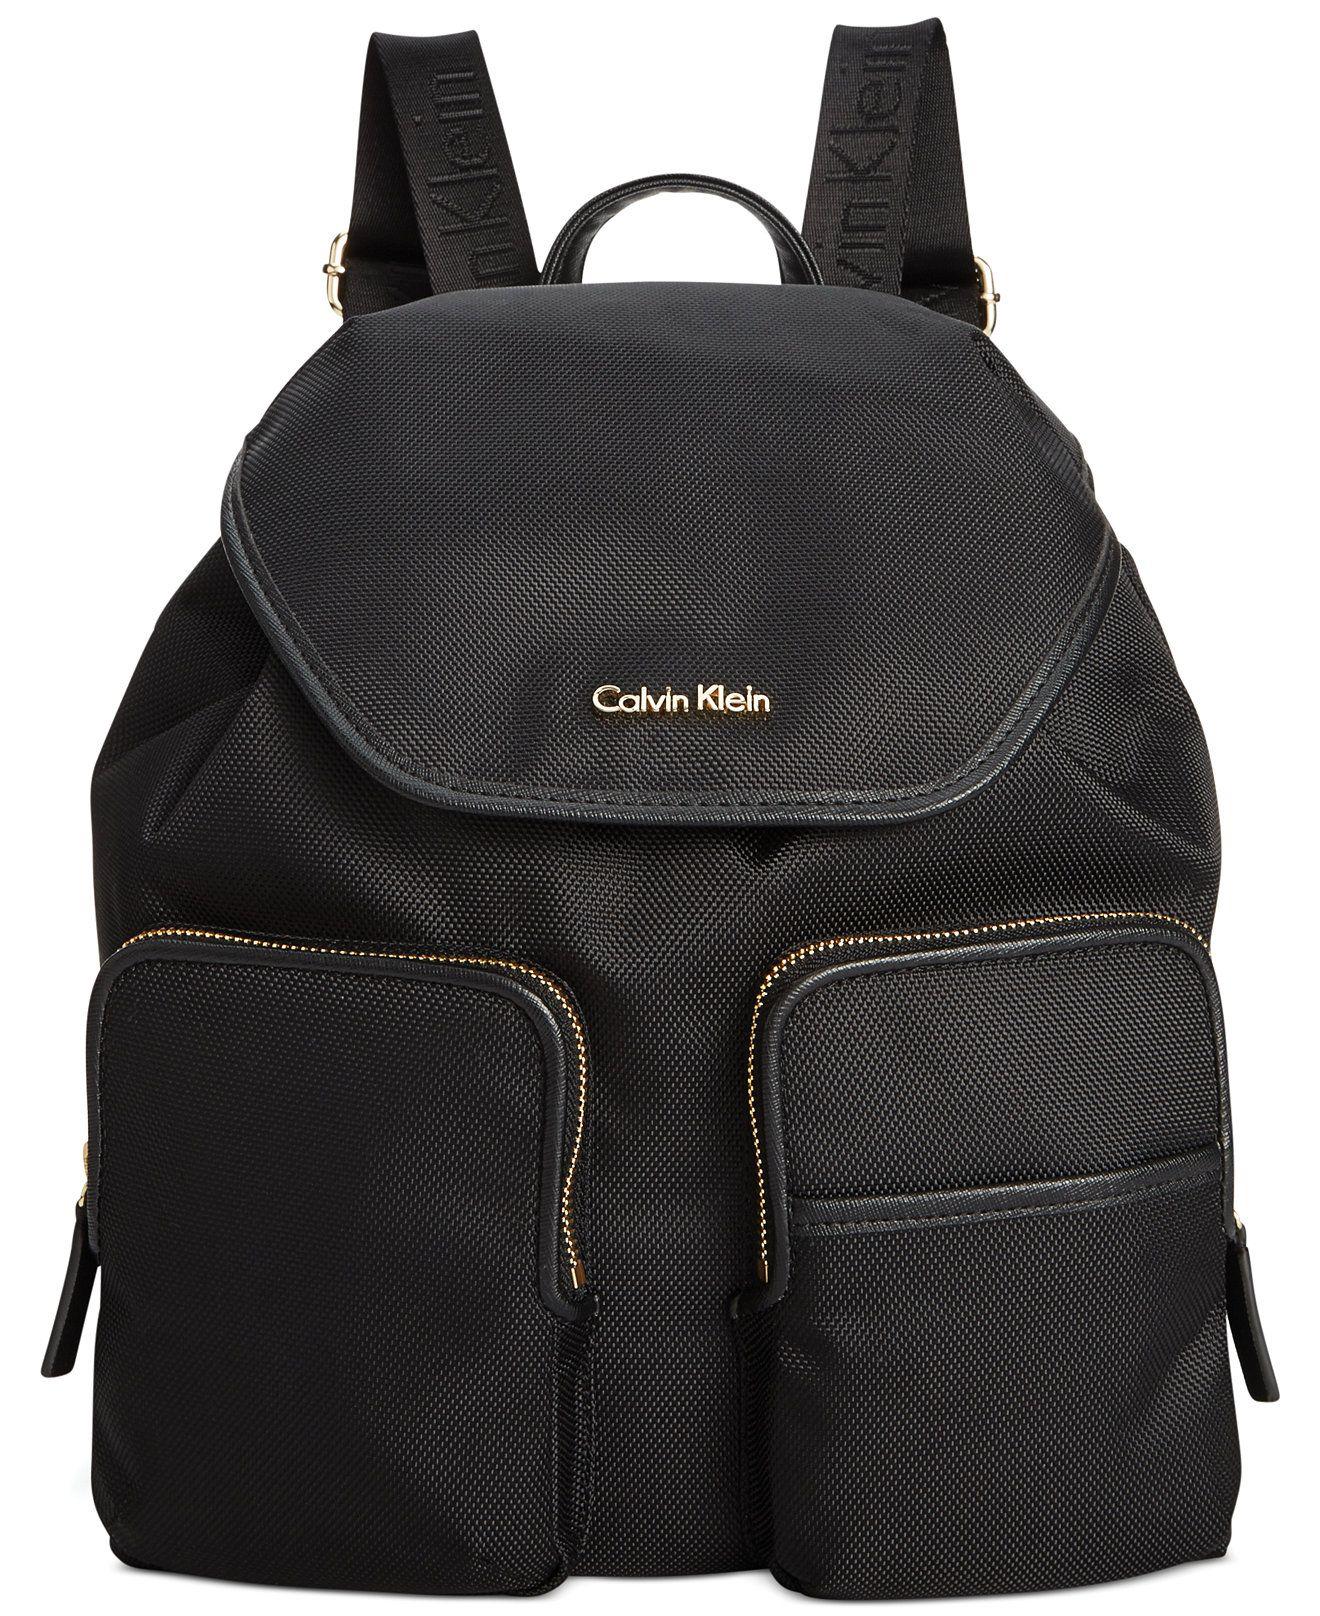 c0edca7fac Calvin Klein Parker Ballistic Nylon Backpack - Backpacks - Handbags  amp   Accessories - Macy s Rucksack